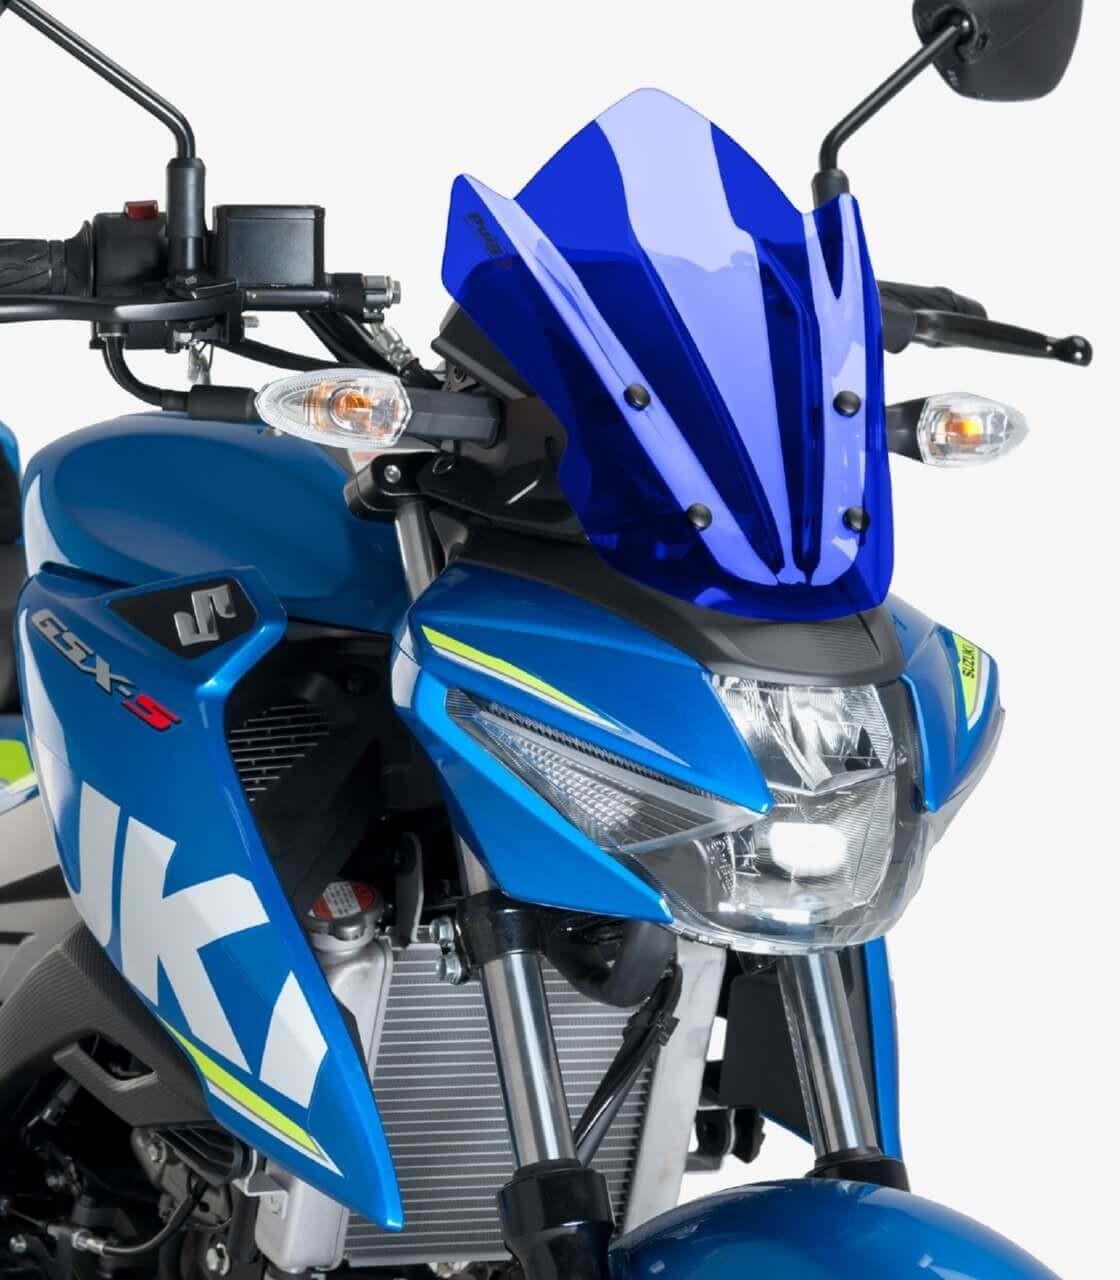 PUIG HI-TECH PARTS - 9436H - Race Windscreen Suzuki GSX-S